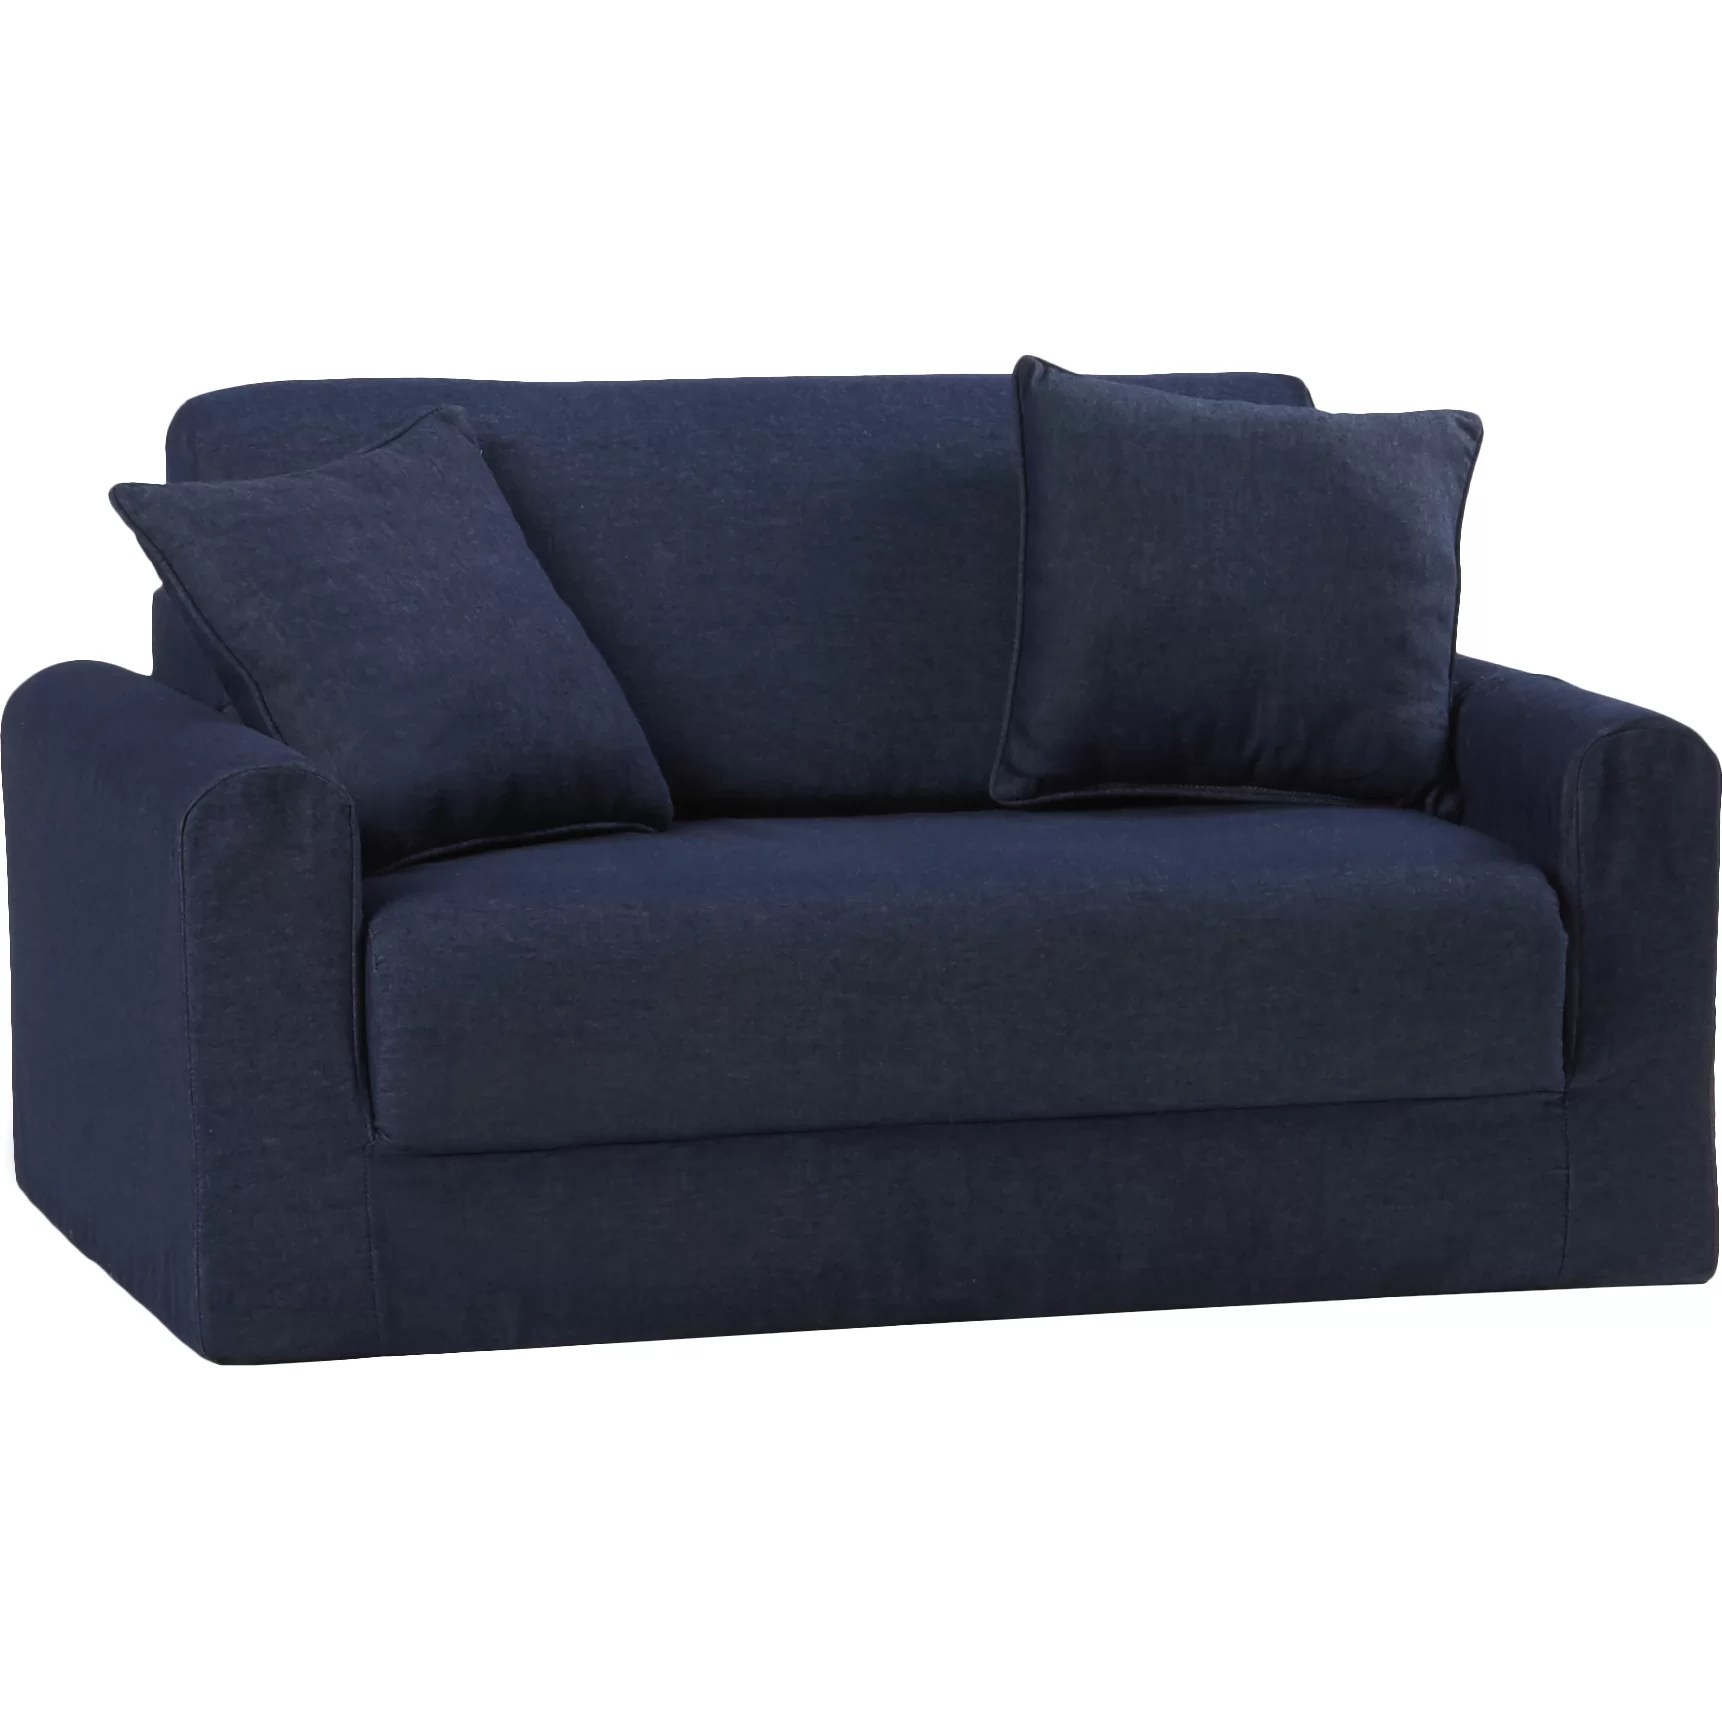 child sleeper sofa rattan corner argos fun furnishings children 39s suede and reviews